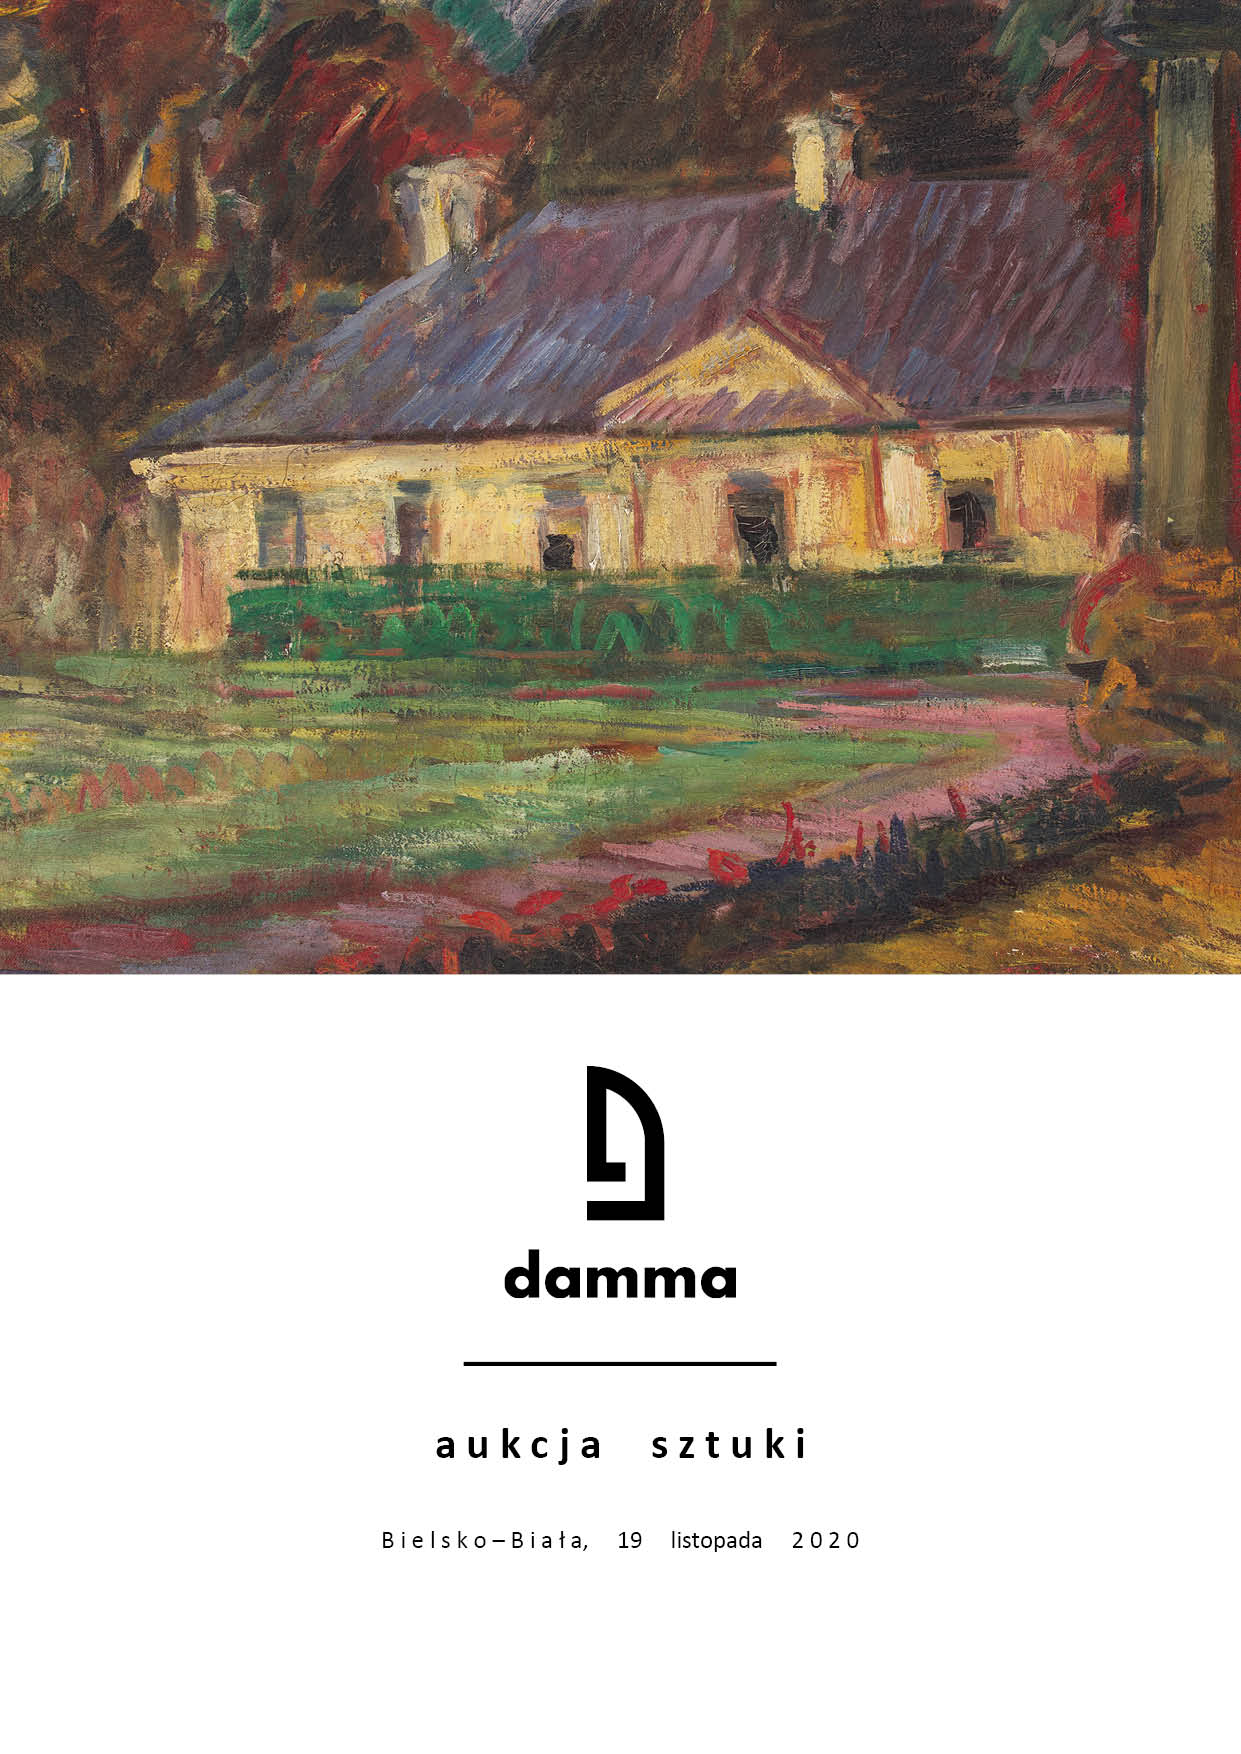 Katalog aukcji sztuki 12